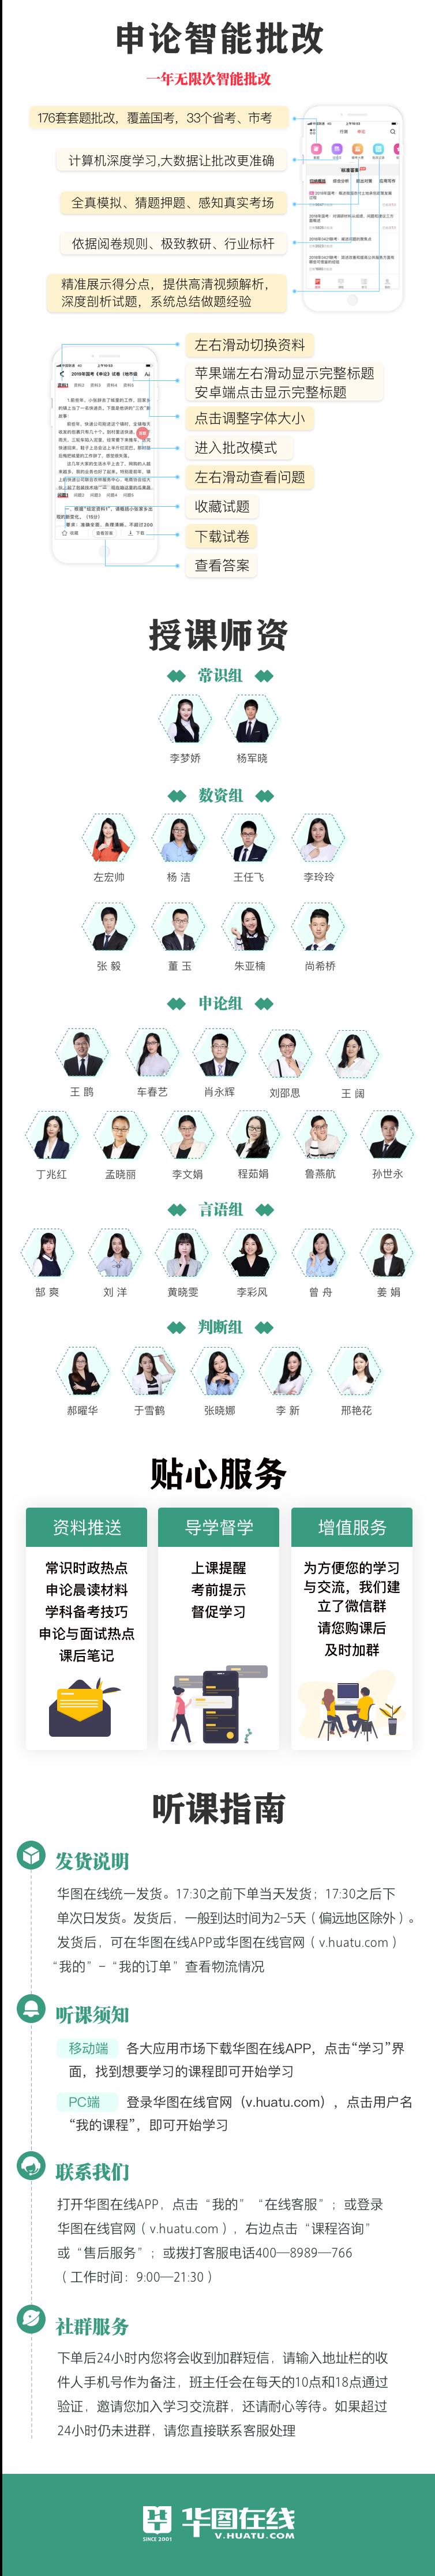 http://upload.htexam.com/userimg/2021国考系统提分班师资1.png